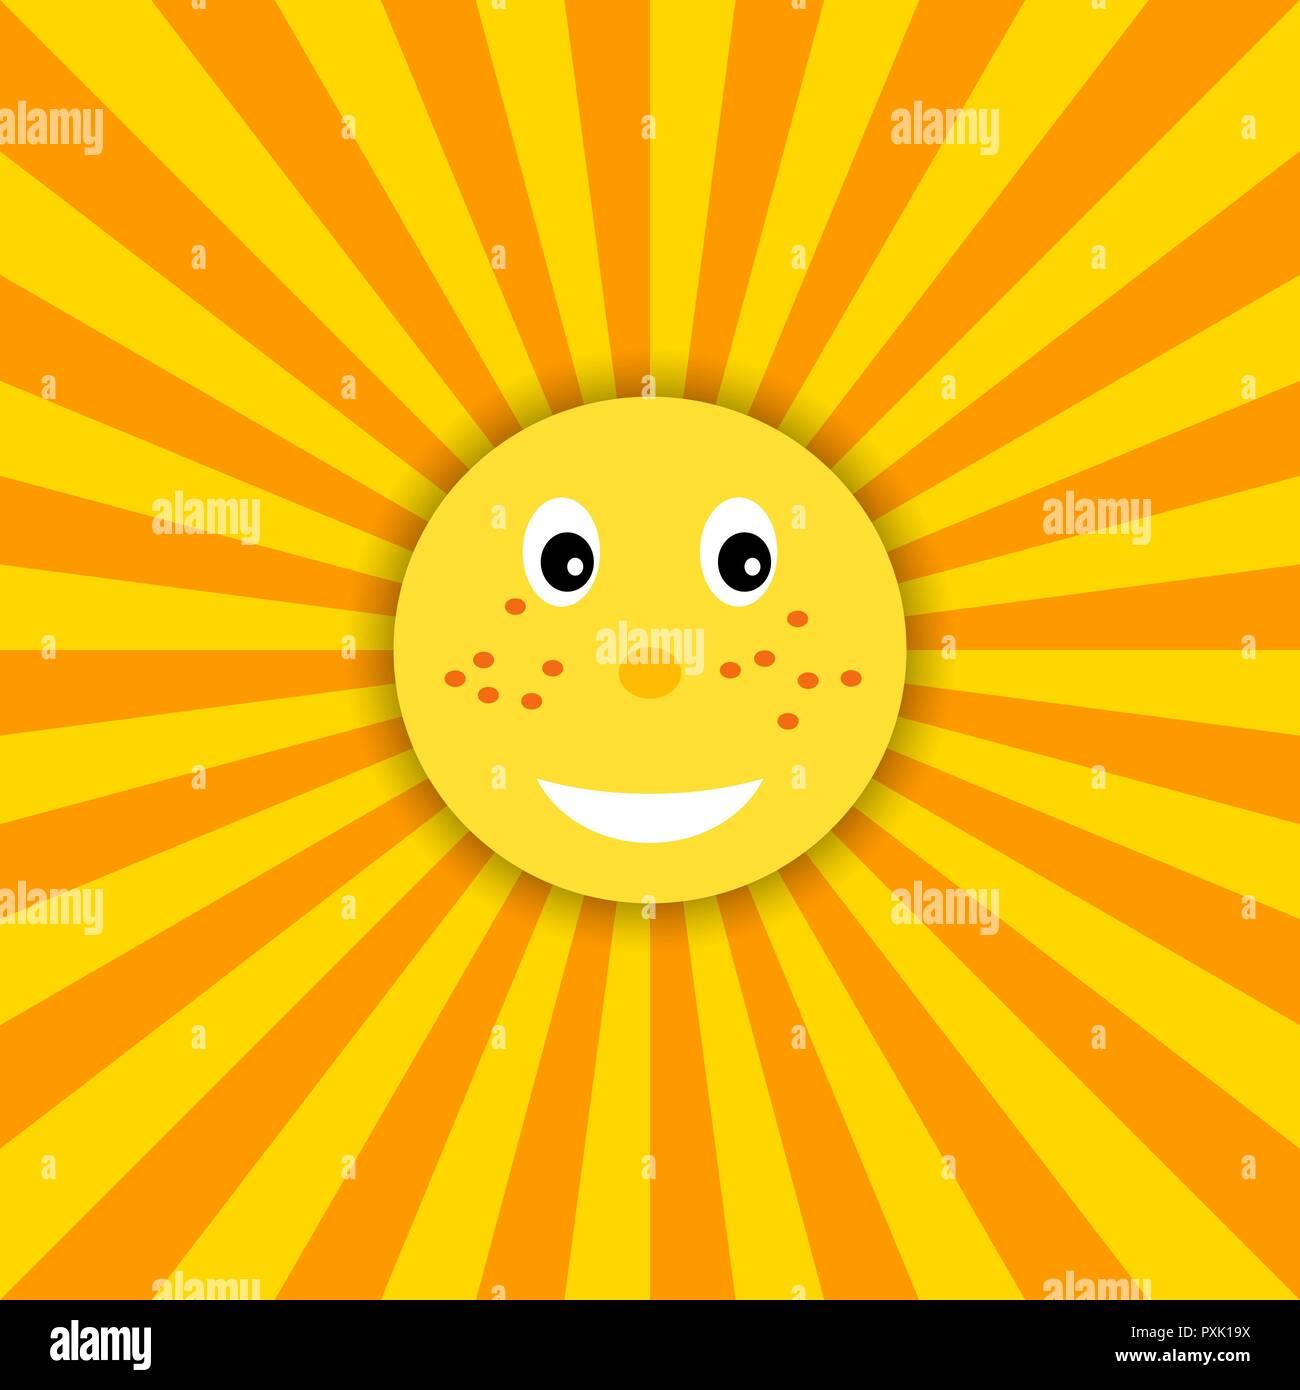 Funny sun icon illustration for kids. Vector - Stock Vector